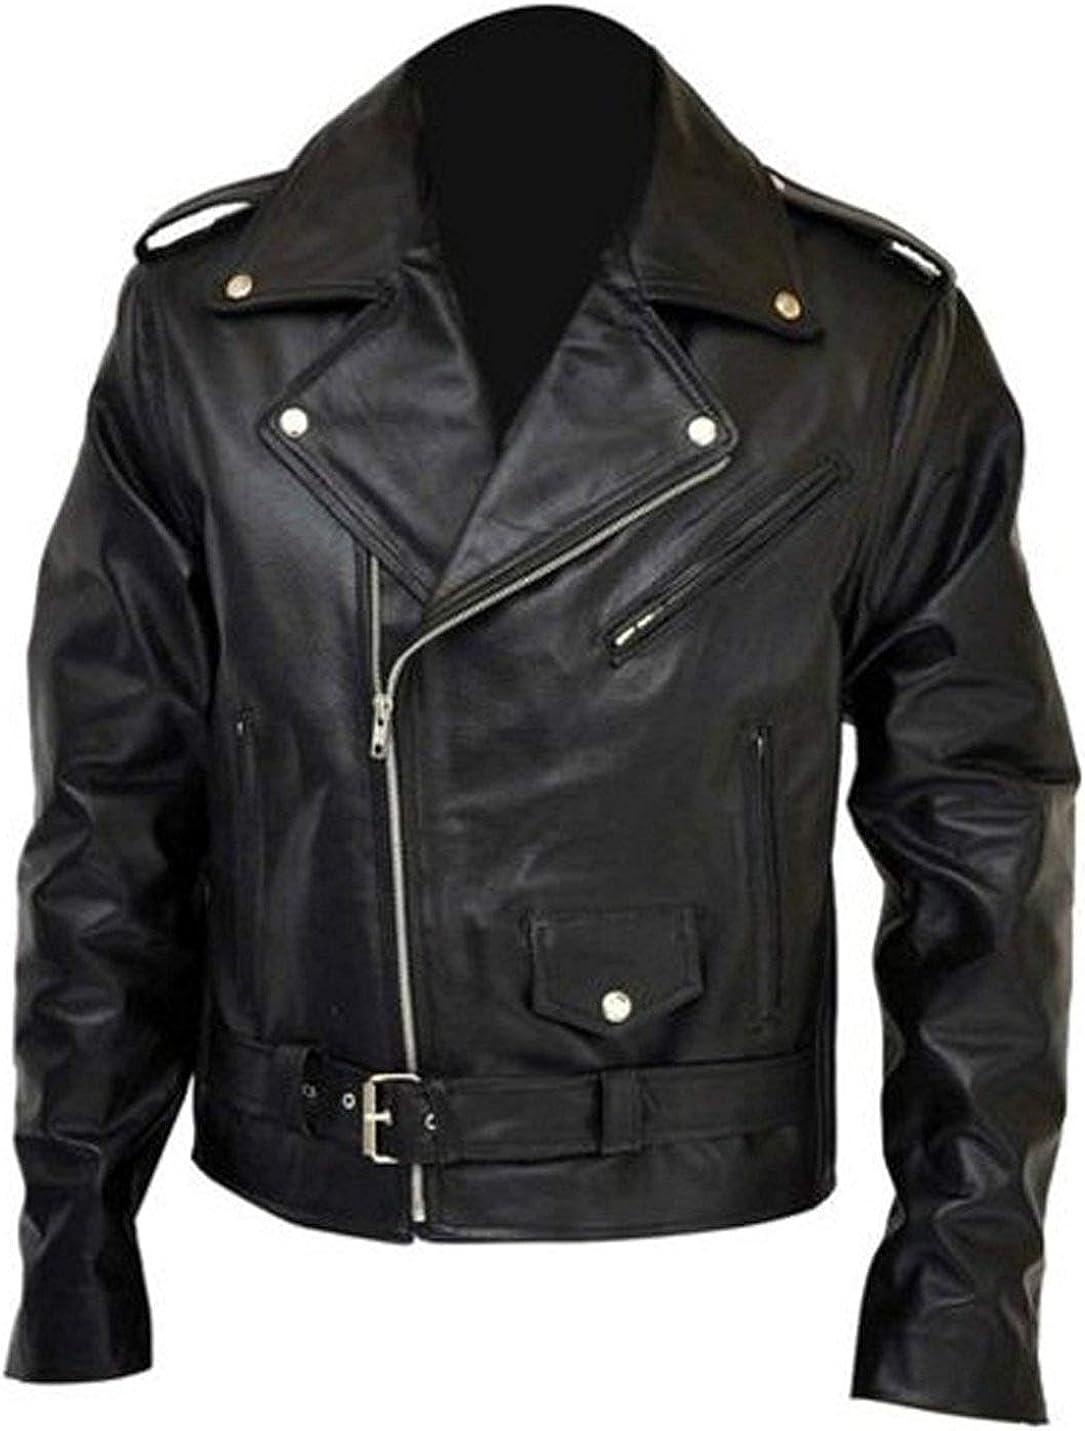 Judgment Day Fantasy Real Leather Jacket Arnold Schwarzenegger Terminator 2